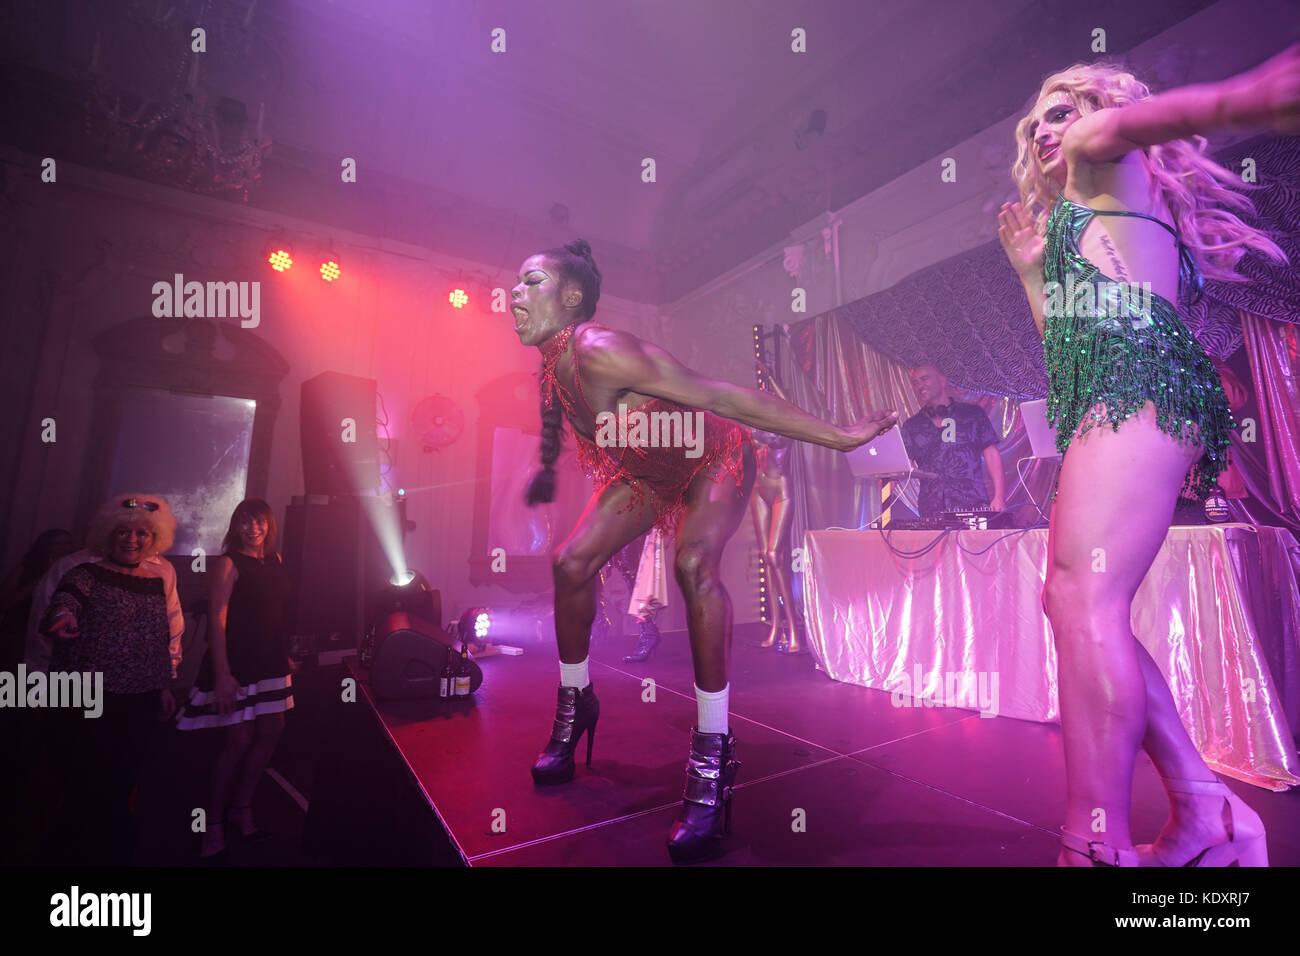 Indian women club night transvestite too, she